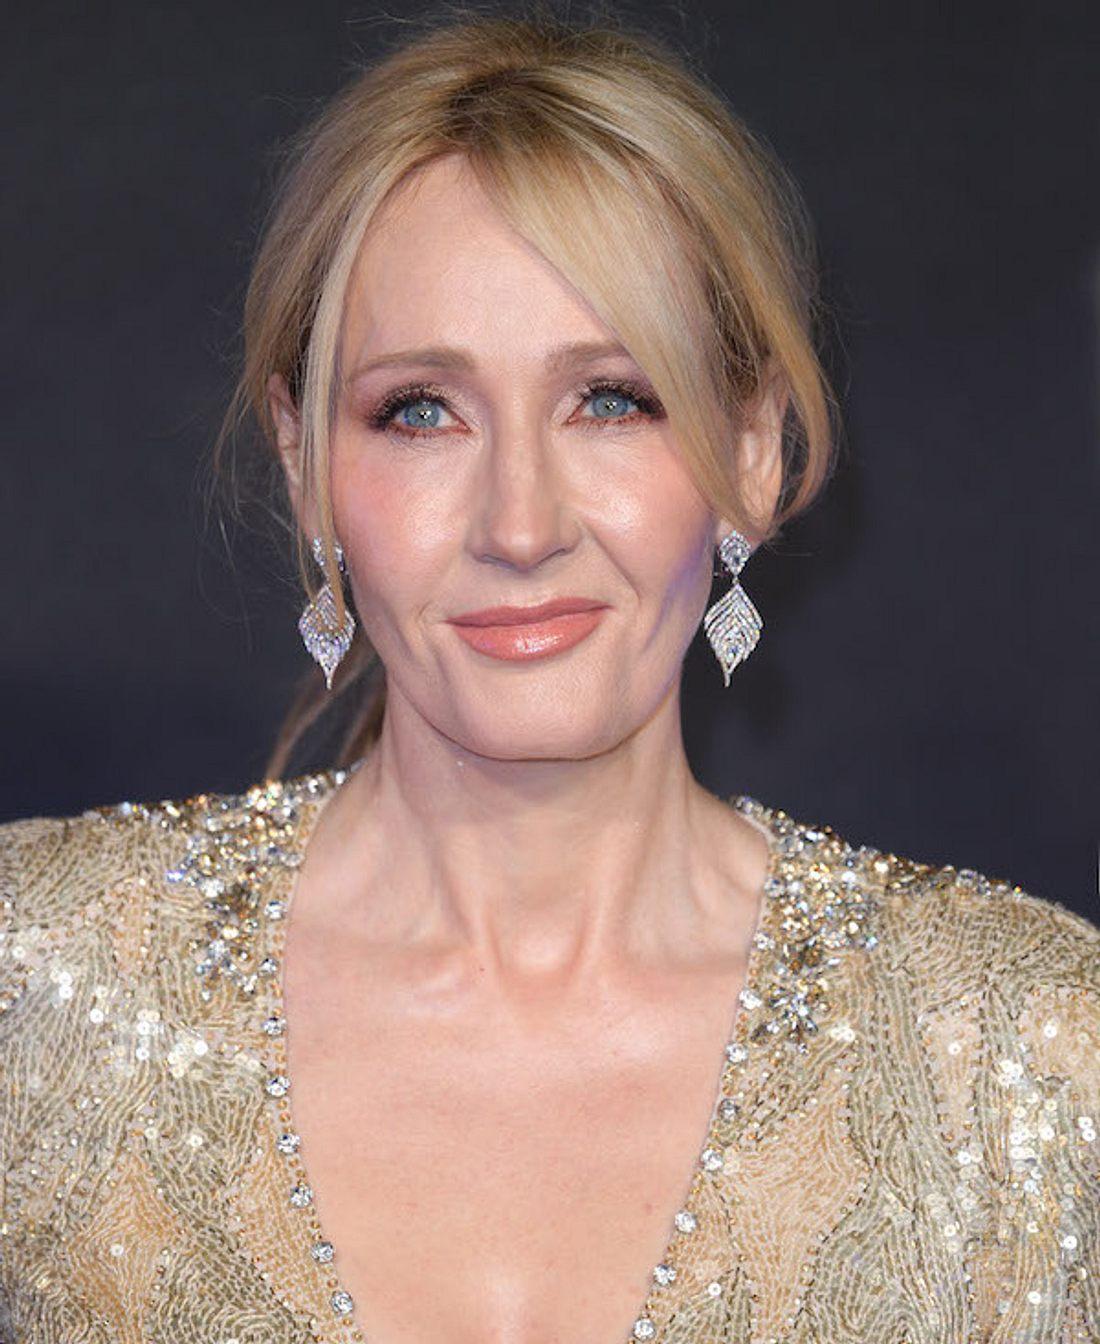 Potter-Fans wollen Bücher verbrennen: So kontert J.K. Rowling